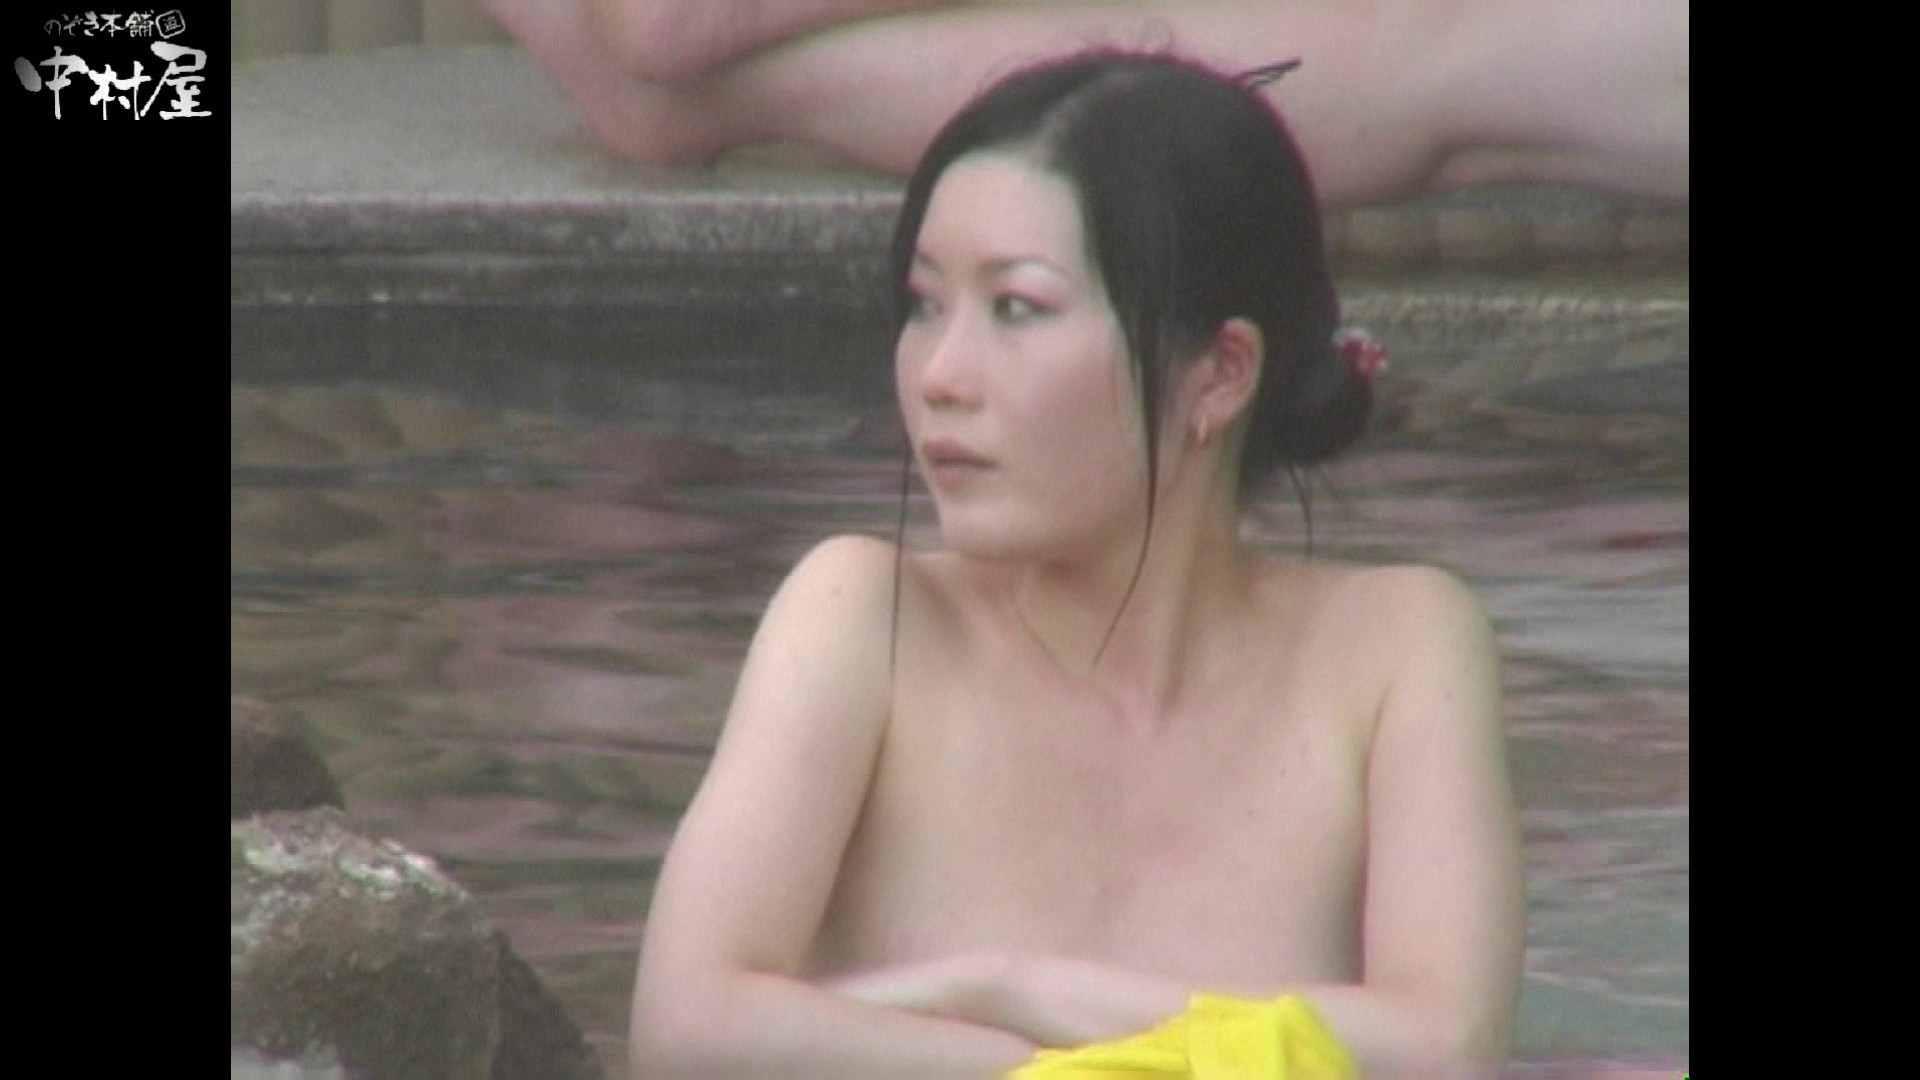 Aquaな露天風呂Vol.940 盗撮  47連発 22